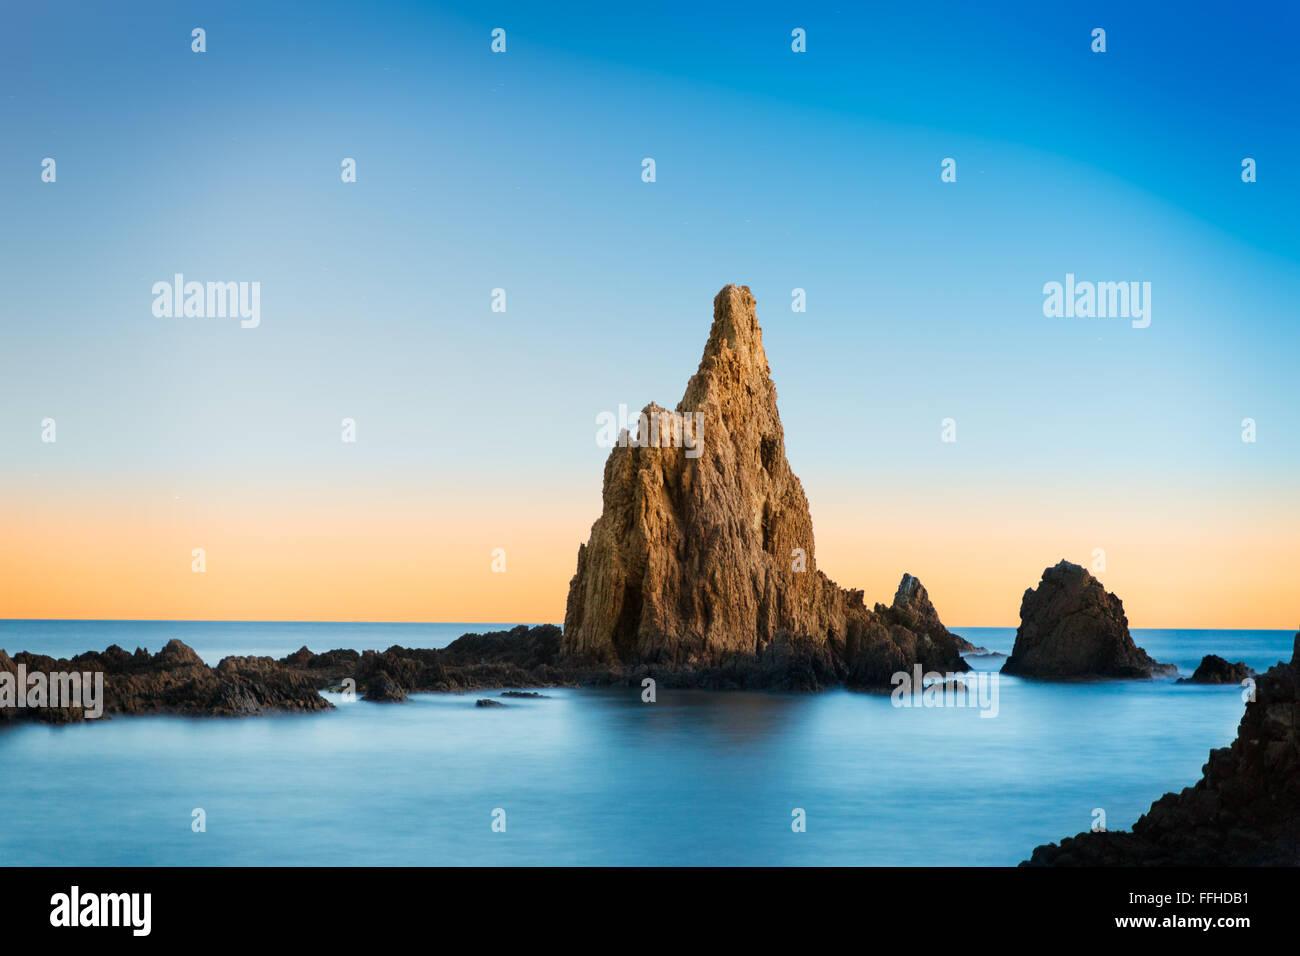 Rock in Mediterranean sea near Cabo de Gata, Spain Stock Photo